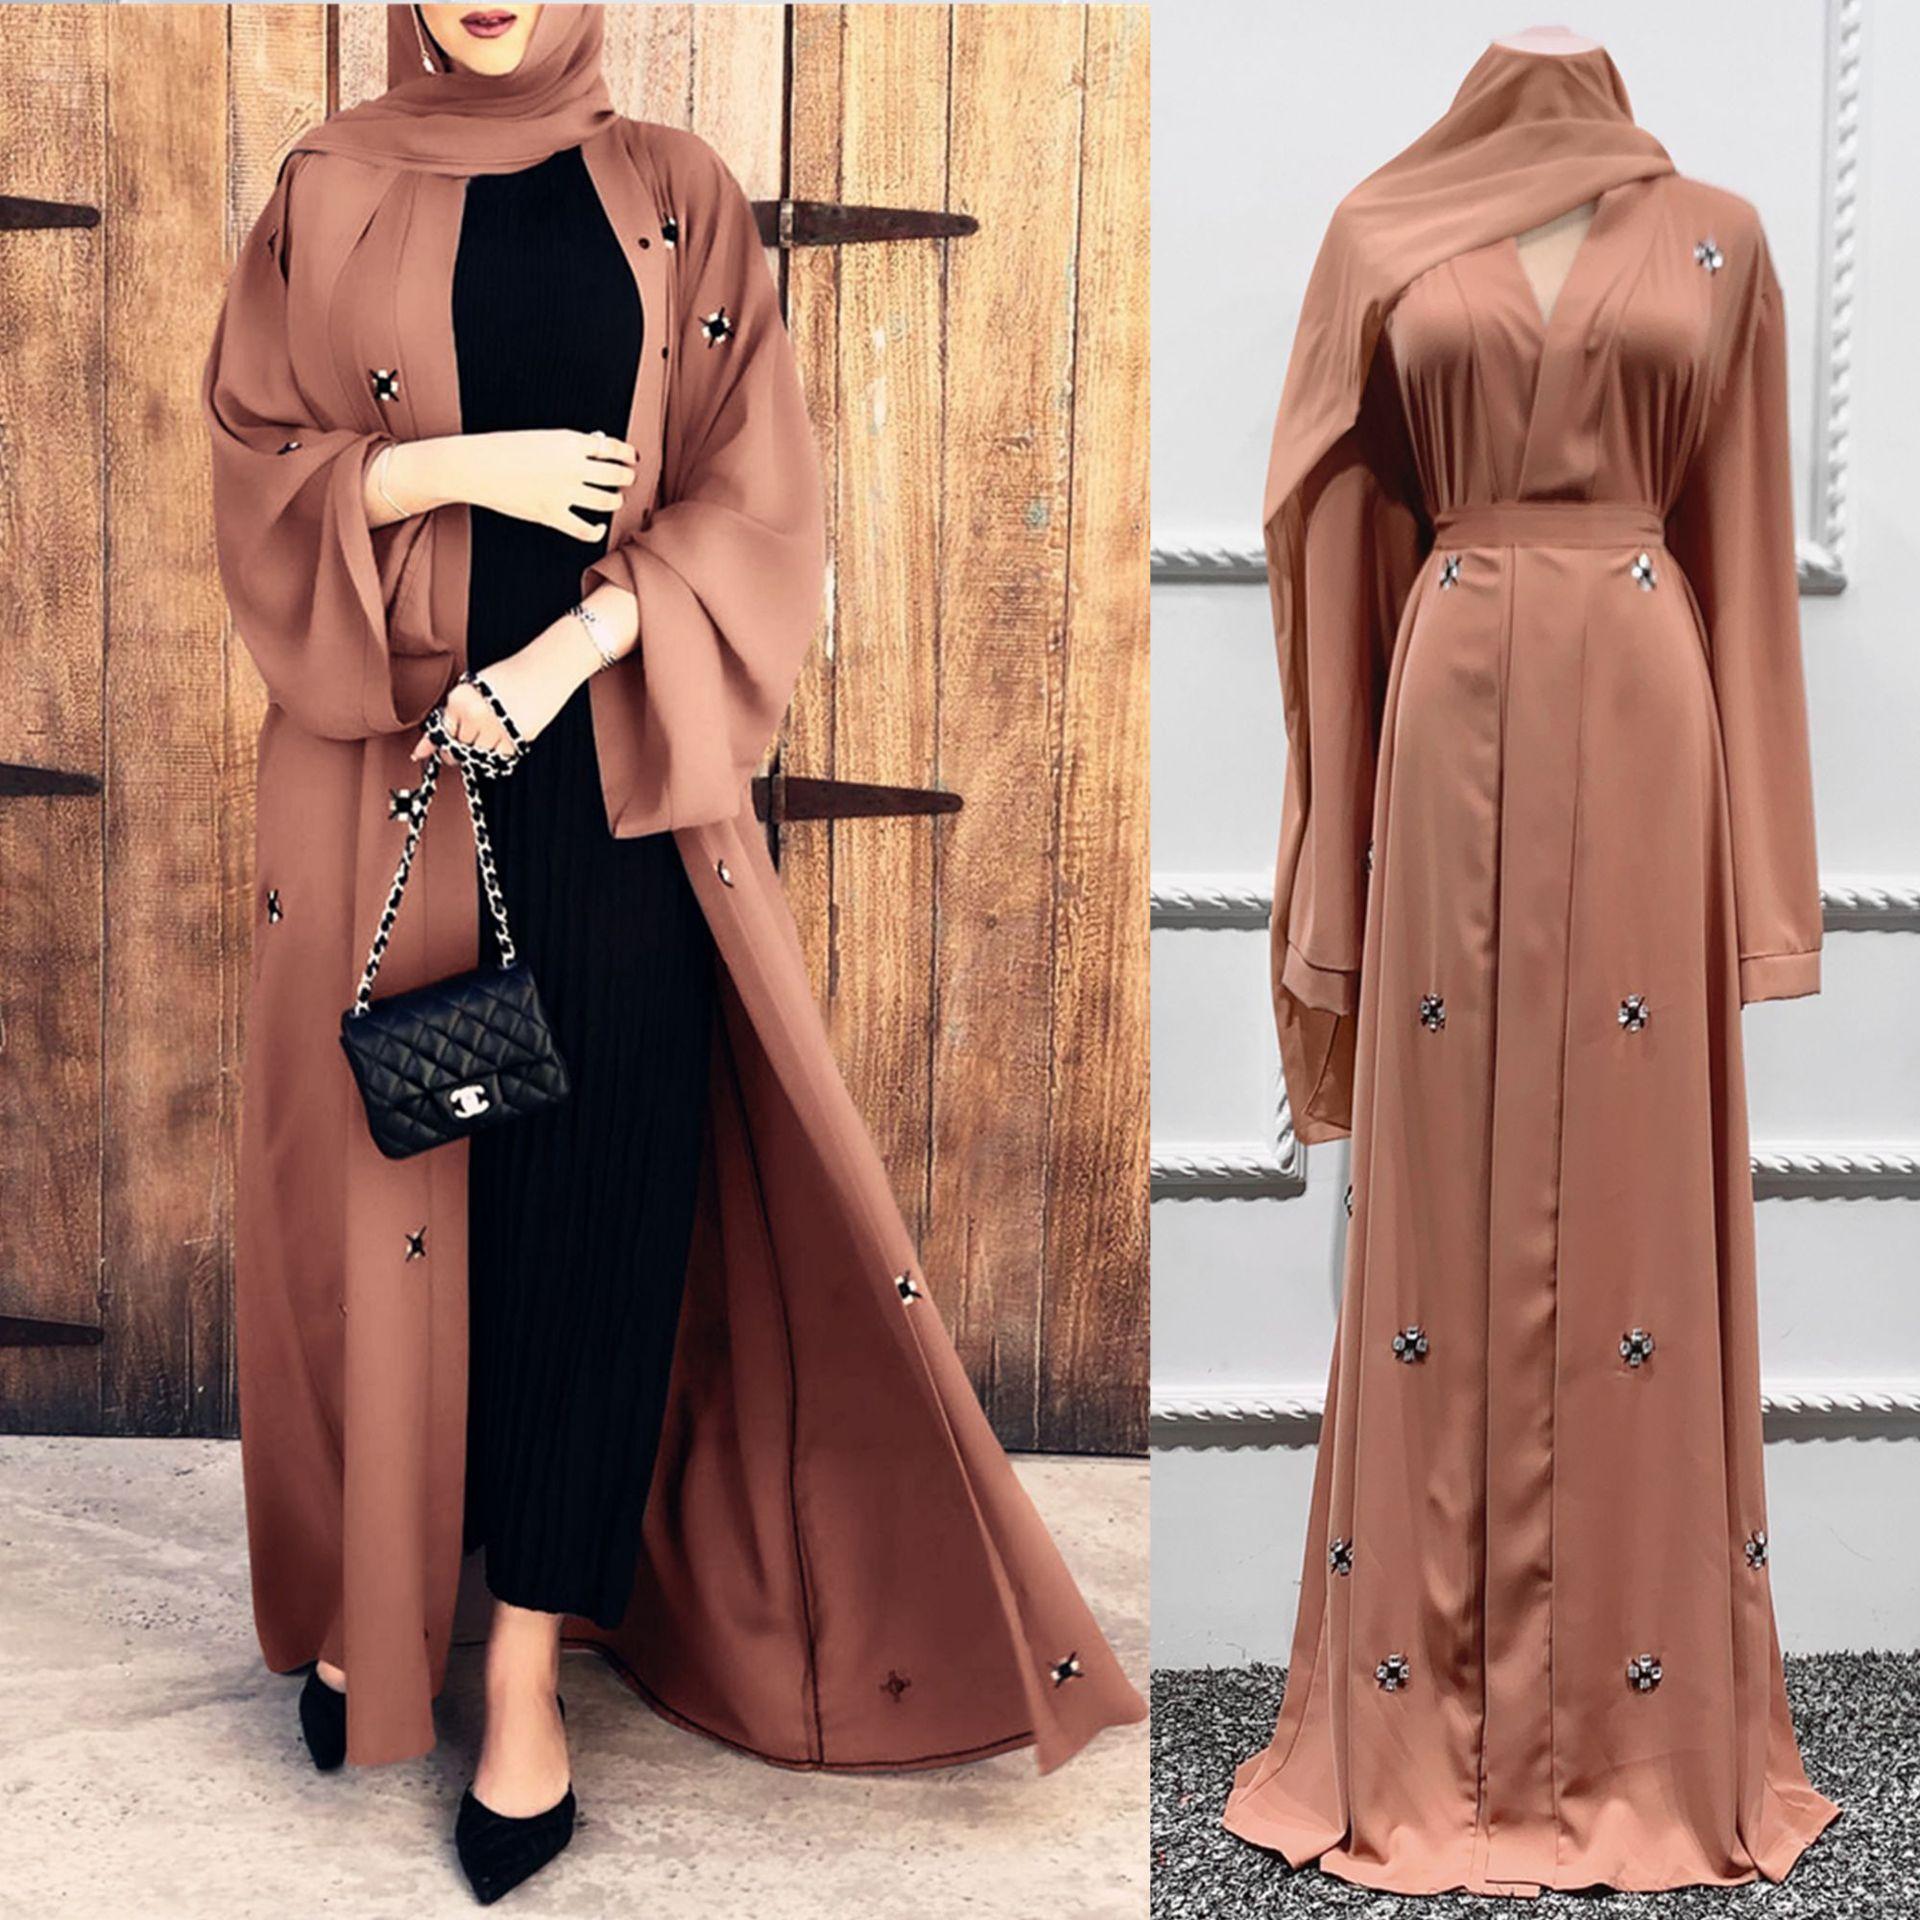 Ramadan Eid Open Abaya Dubai Turkey Hijab Dress Abayas for Women Mubarak Arabic Islam Clothing Caftan Kaftan Robe Djellaba Femme